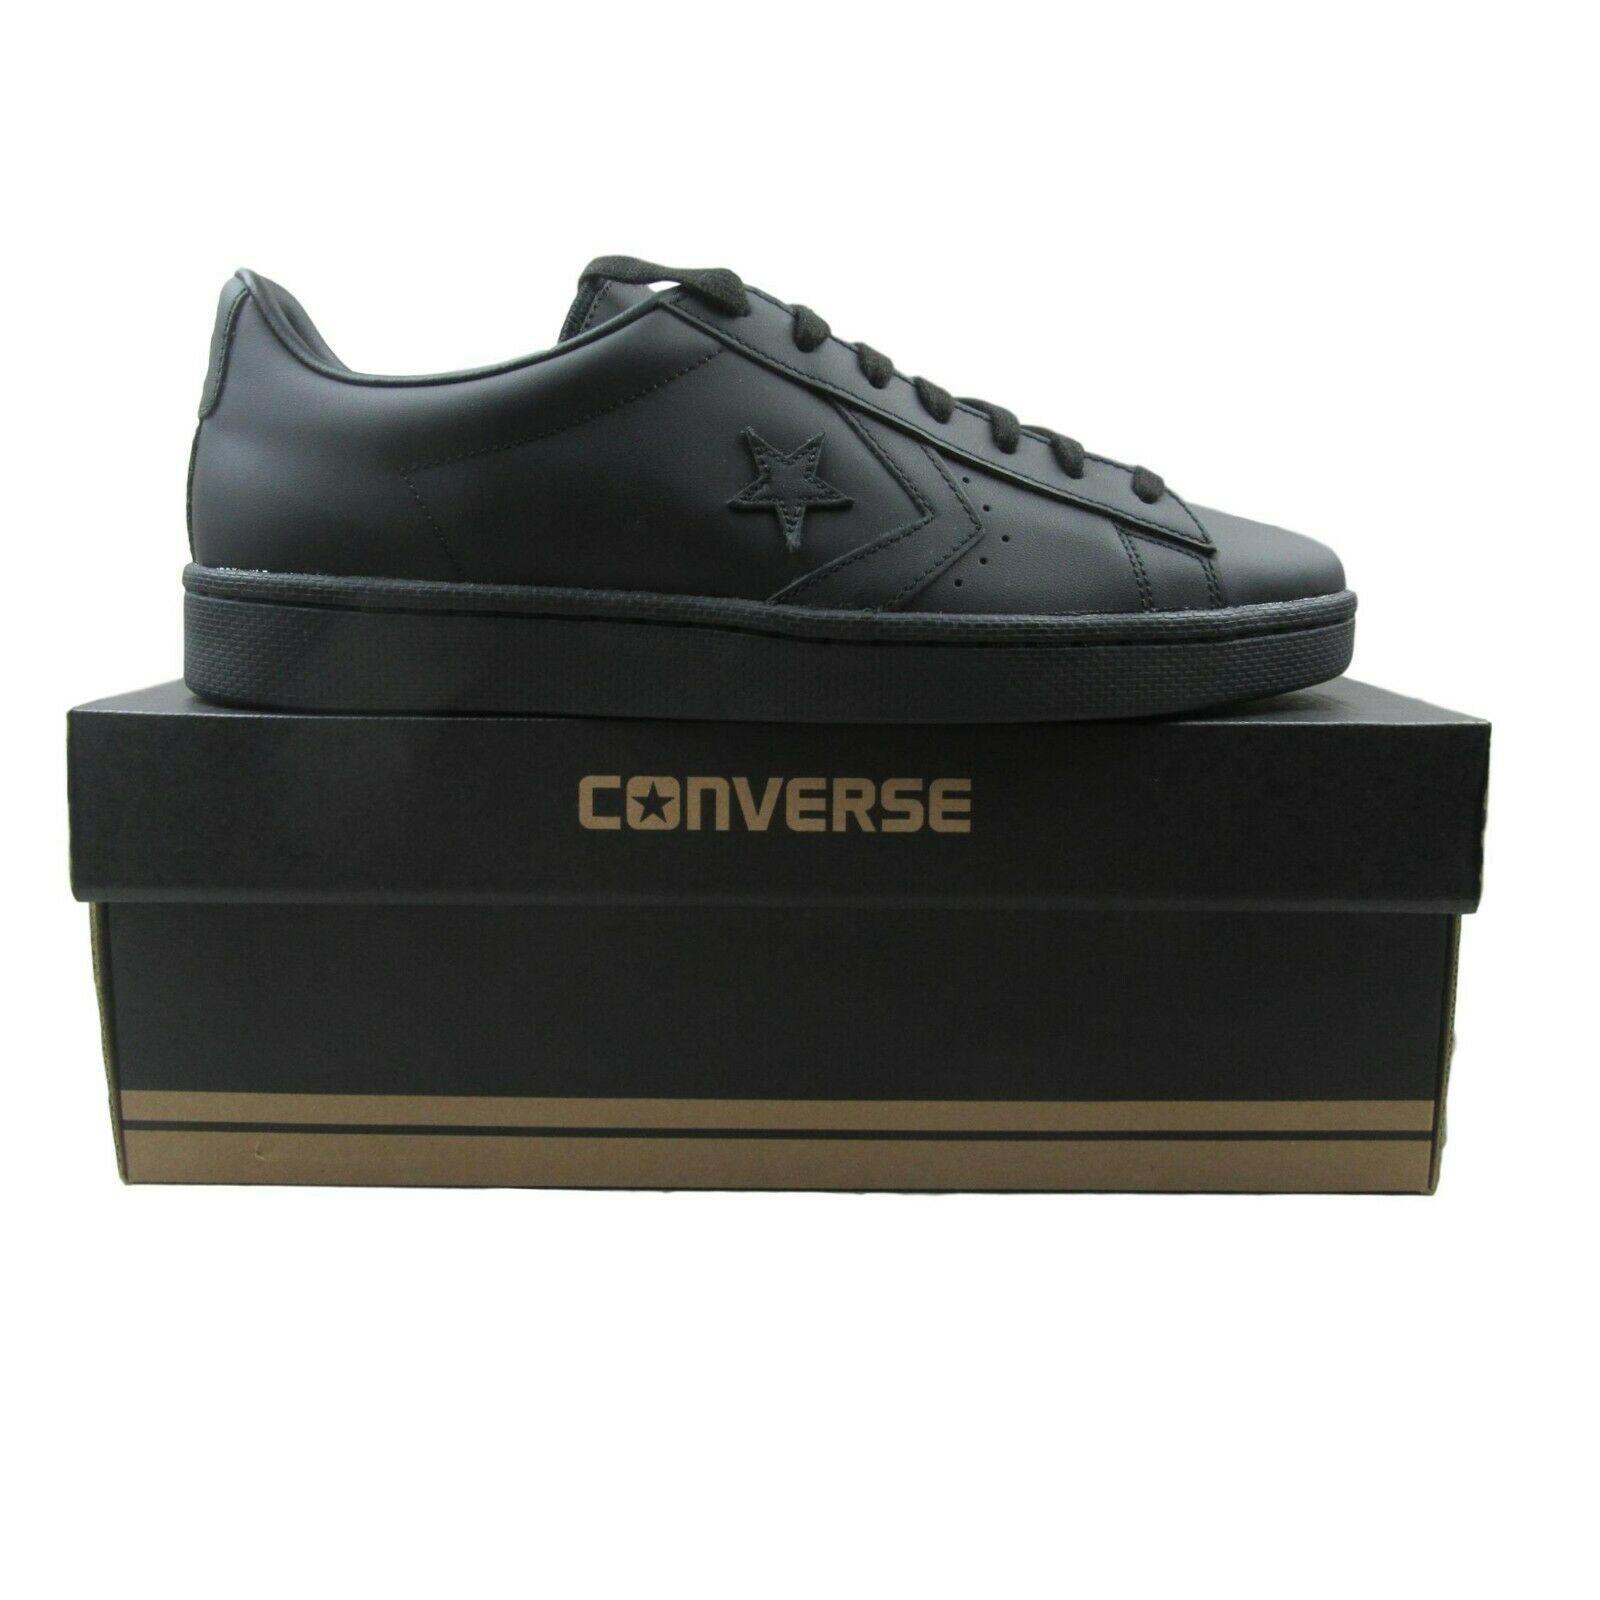 de017aed3ed0 ... Shoes Size 10 Mens 155318C New. Sale! 🔍. converse-pro-leather -76-ox-black-leather-low-